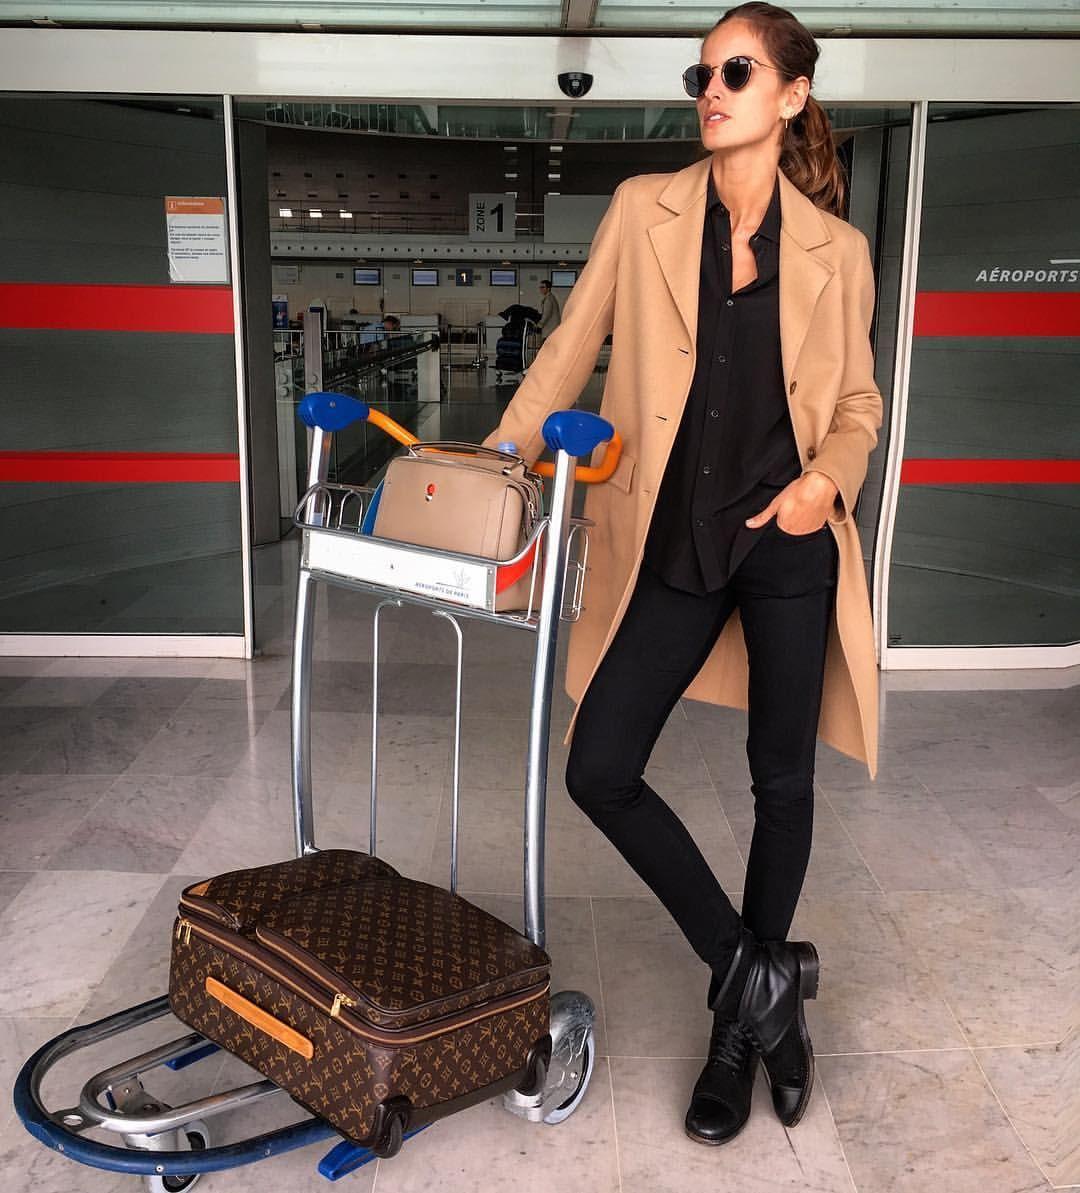 Now off to Milan ✈️🇮🇹 A caminho de Milão! #work #travel #ootd #style #enroute #nextstop #milano